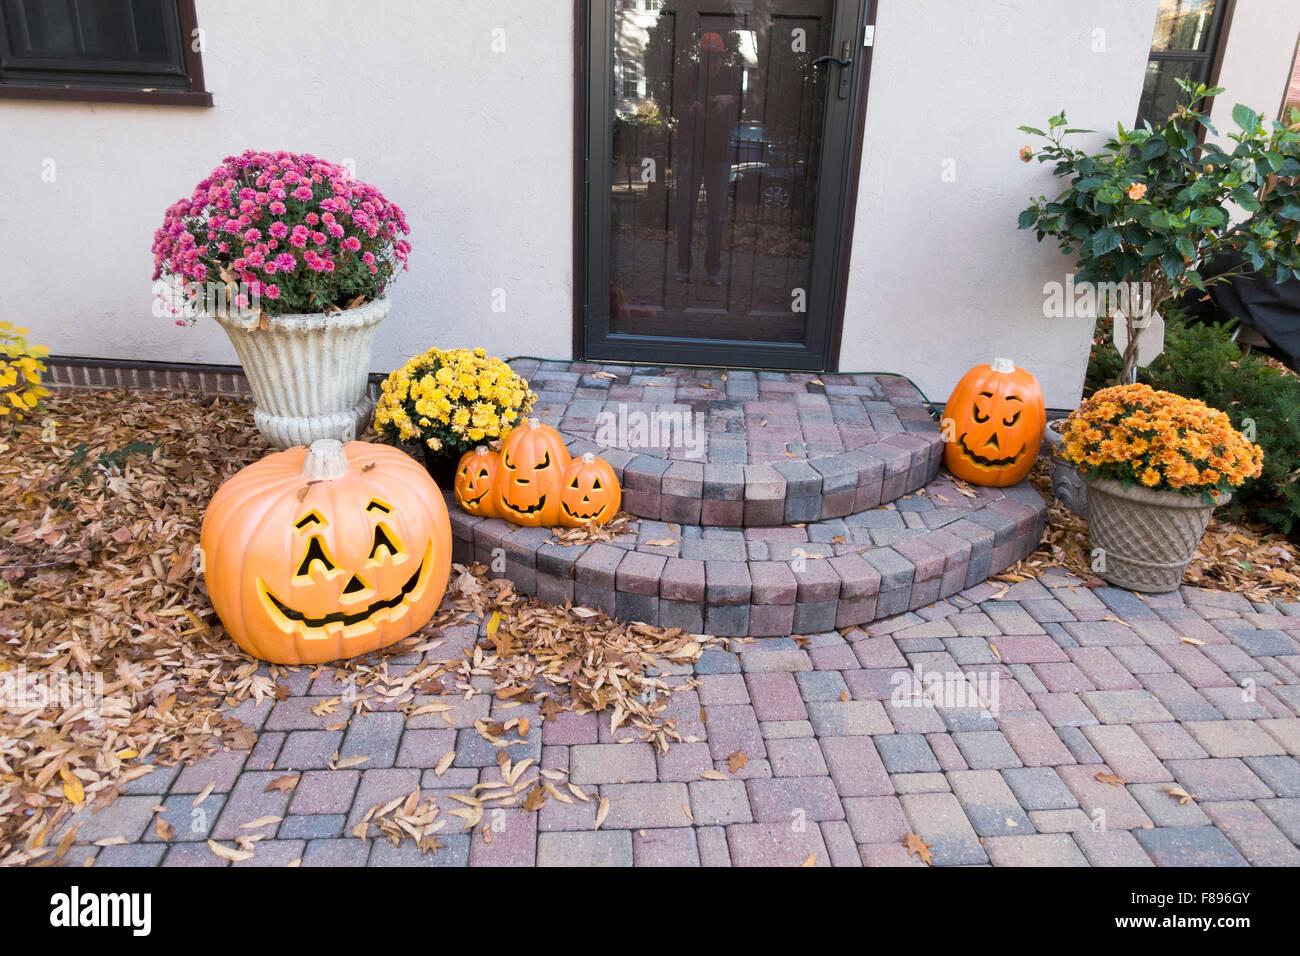 Halloween jack-o'-lanterns adoring the steps and sidewalk designed with randomly placed bricks.  St Paul Minnesota - Stock Image